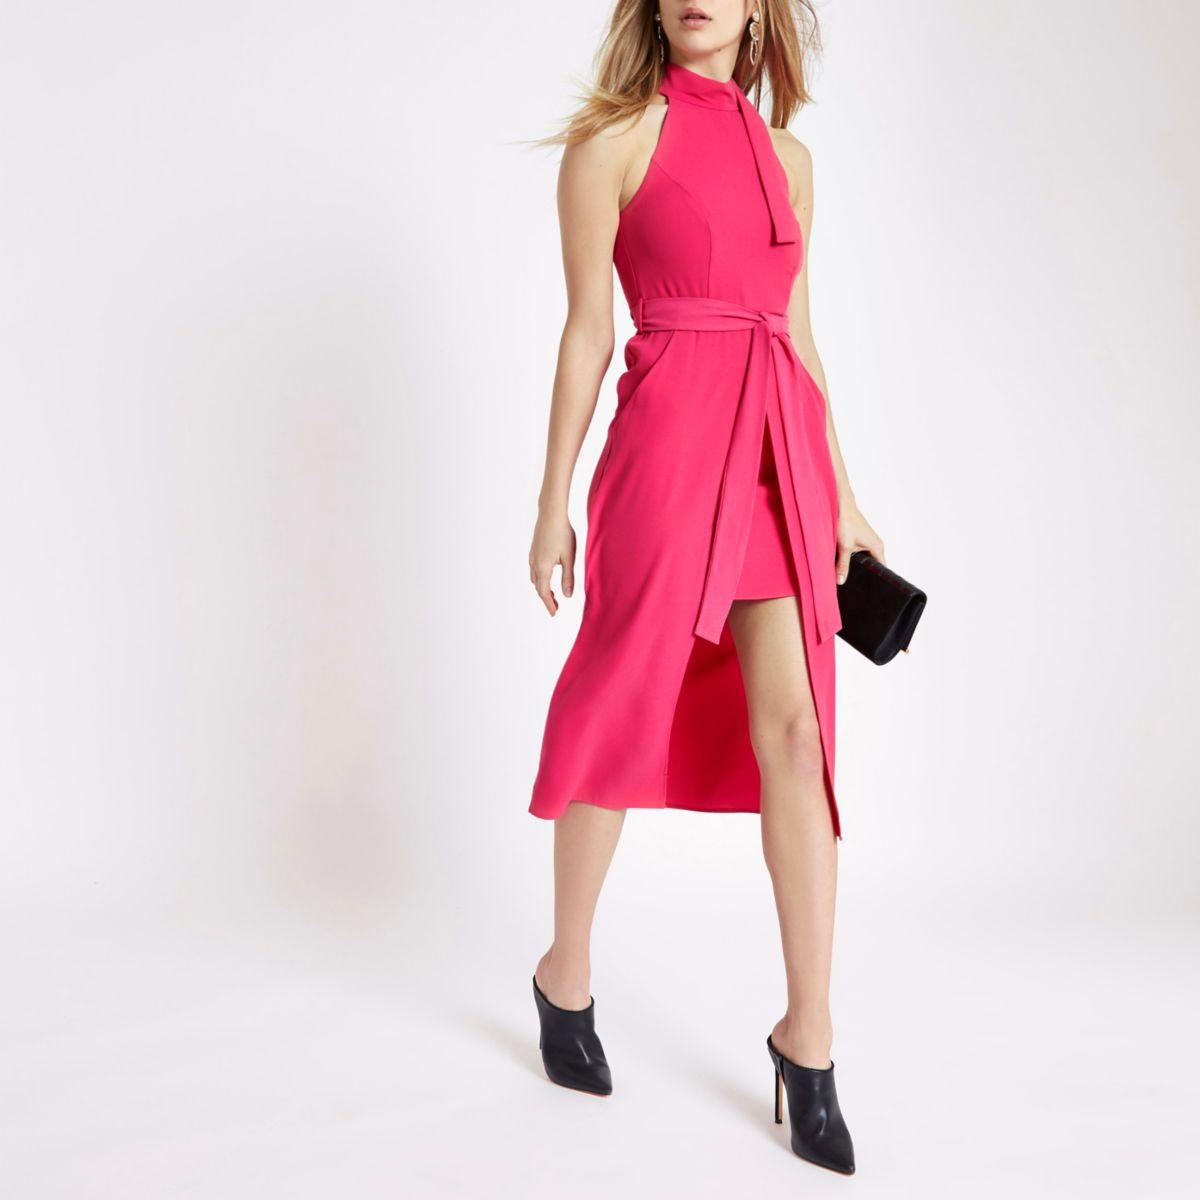 Bright Pink Tie Neck Sleeveless Midi Dress                                  Bright Pink Tie Neck Sleeveless Midi Dress by River Island